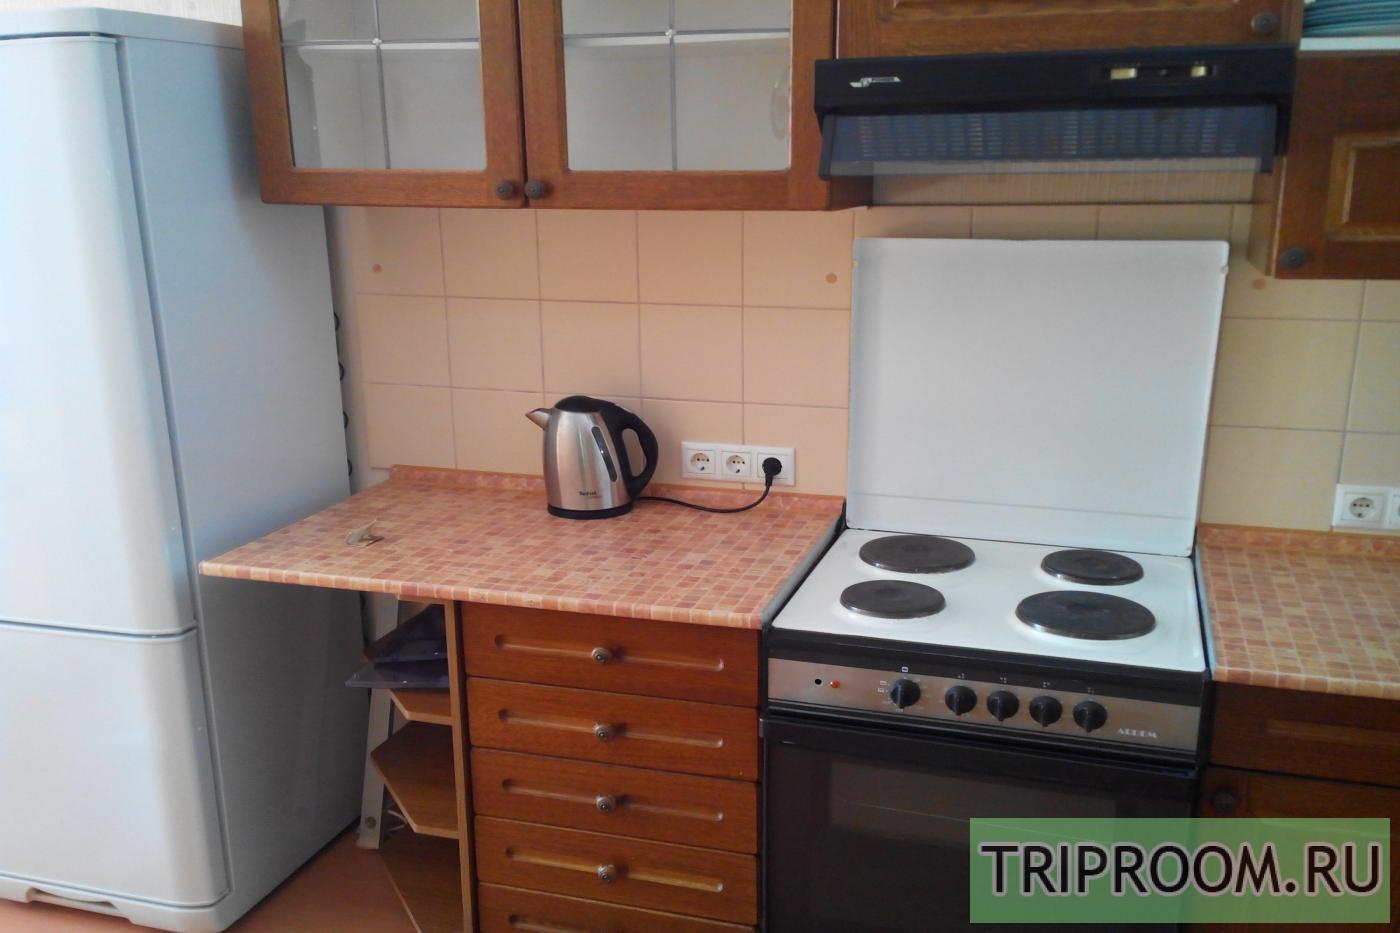 1-комнатная квартира посуточно (вариант № 10468), ул. Ломоносова улица, фото № 4